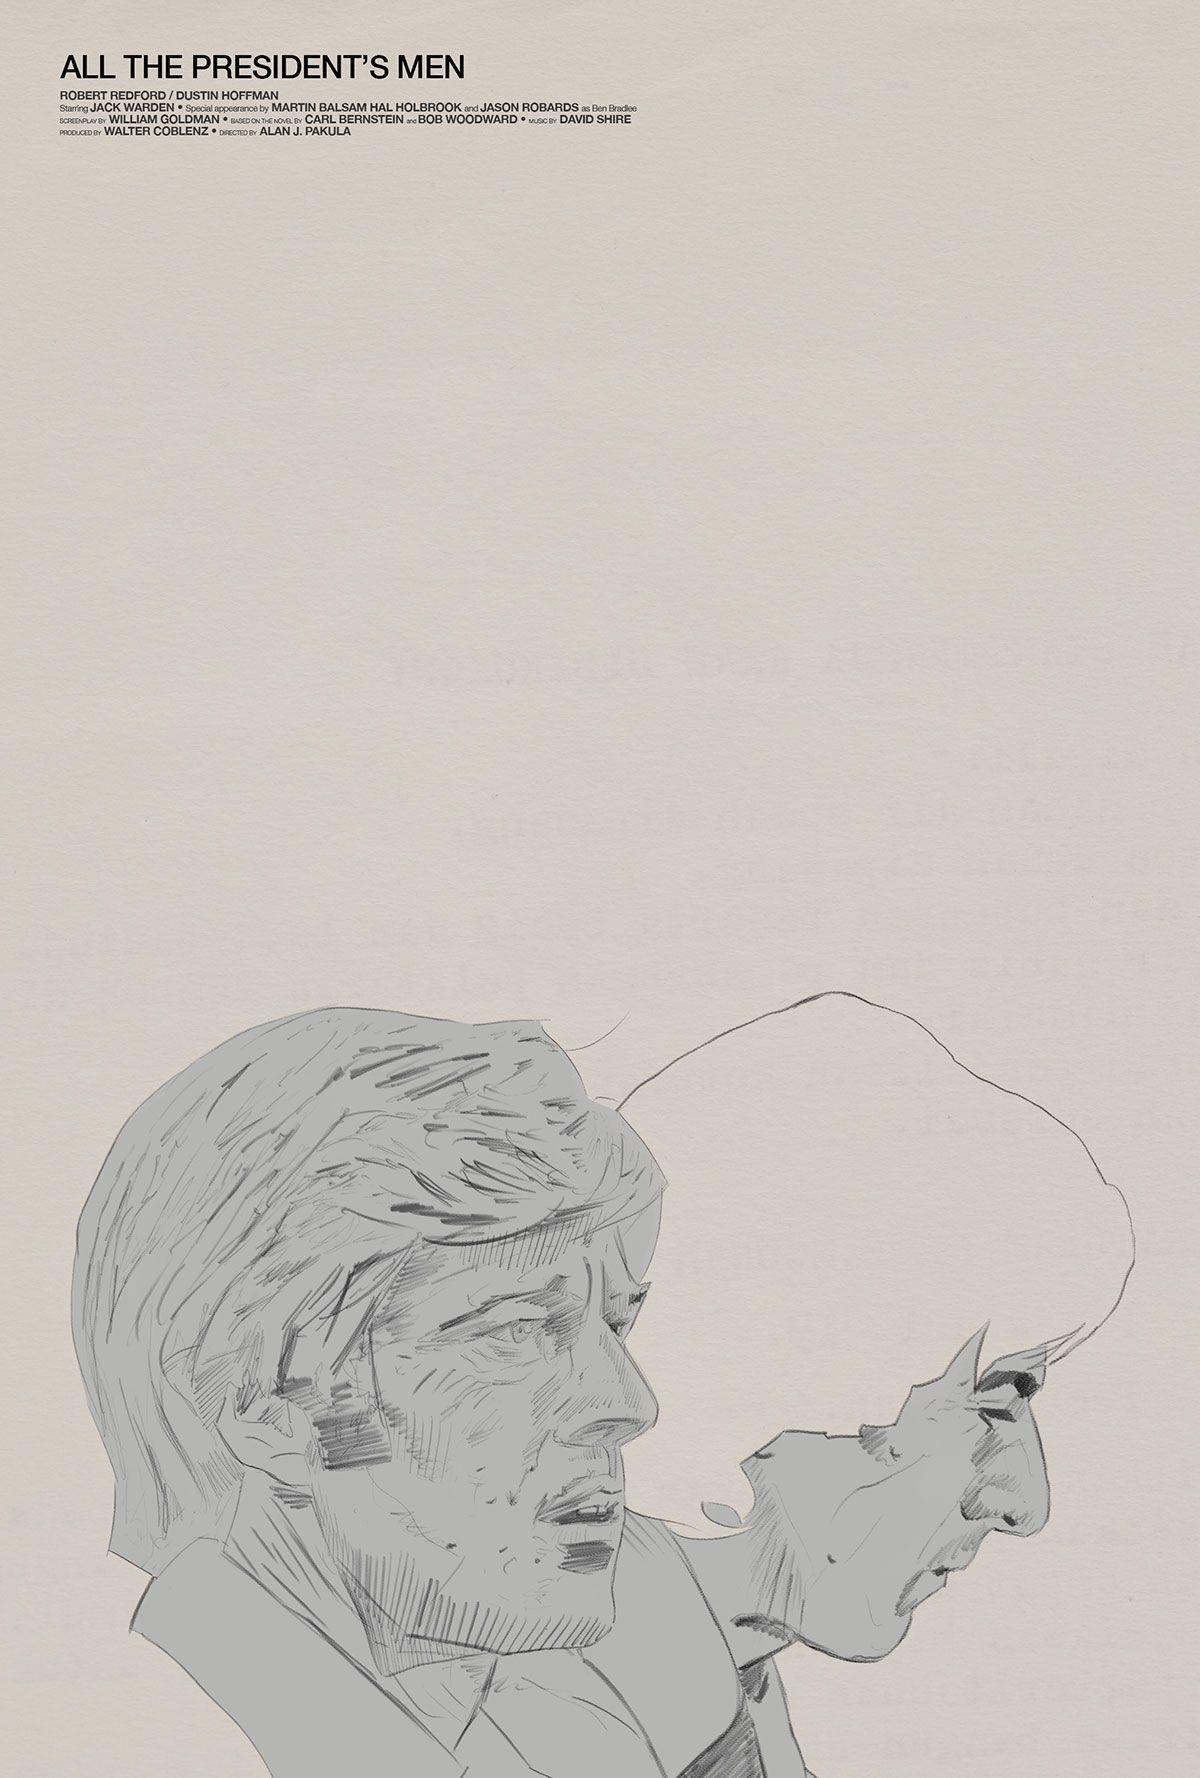 Alan J. Pakula's All The President's Men Film Poster